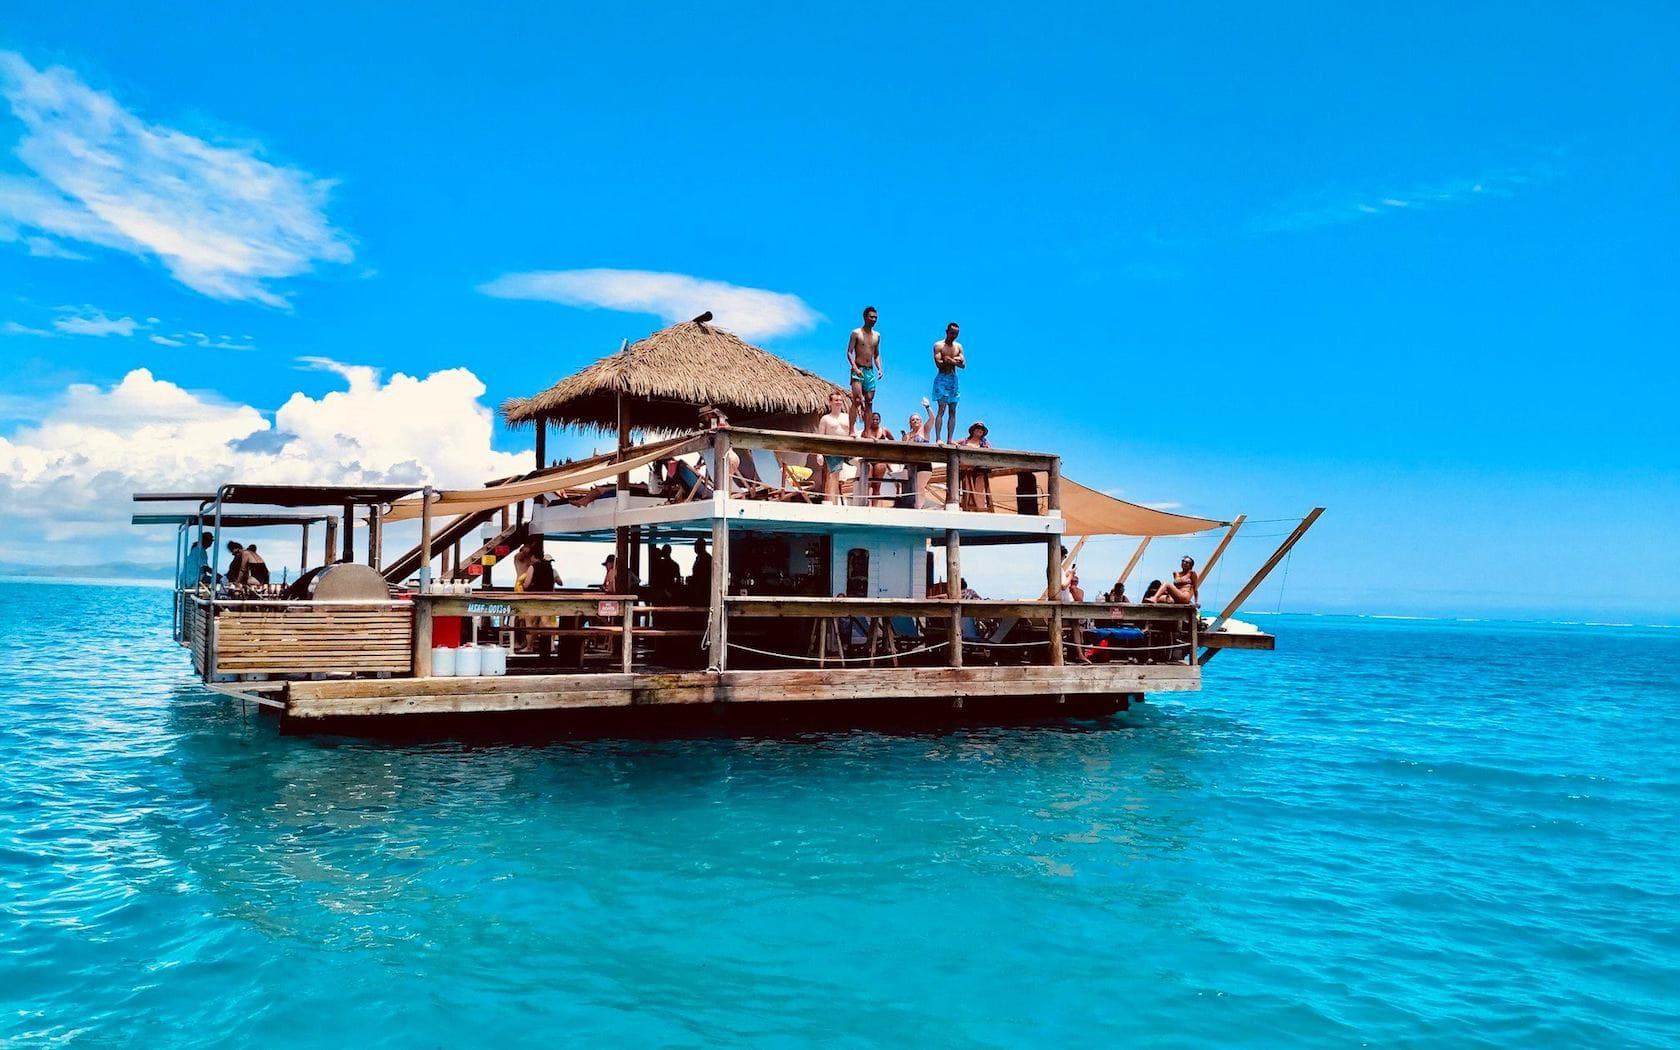 Tawhai Foating Bar